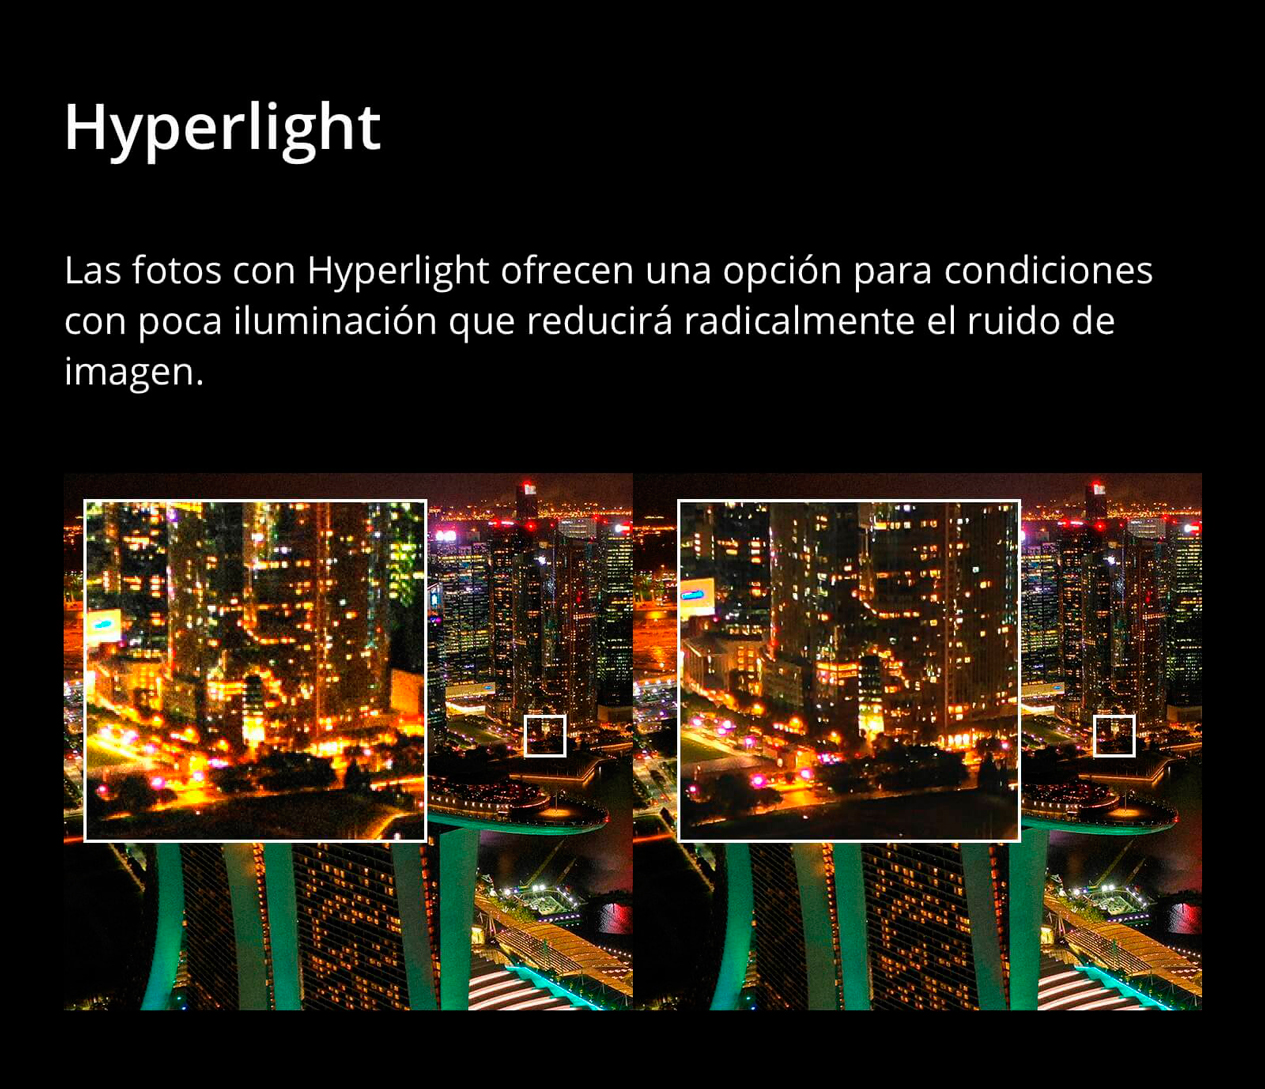 DJI MAVIC 2 PRO - Hyperlight